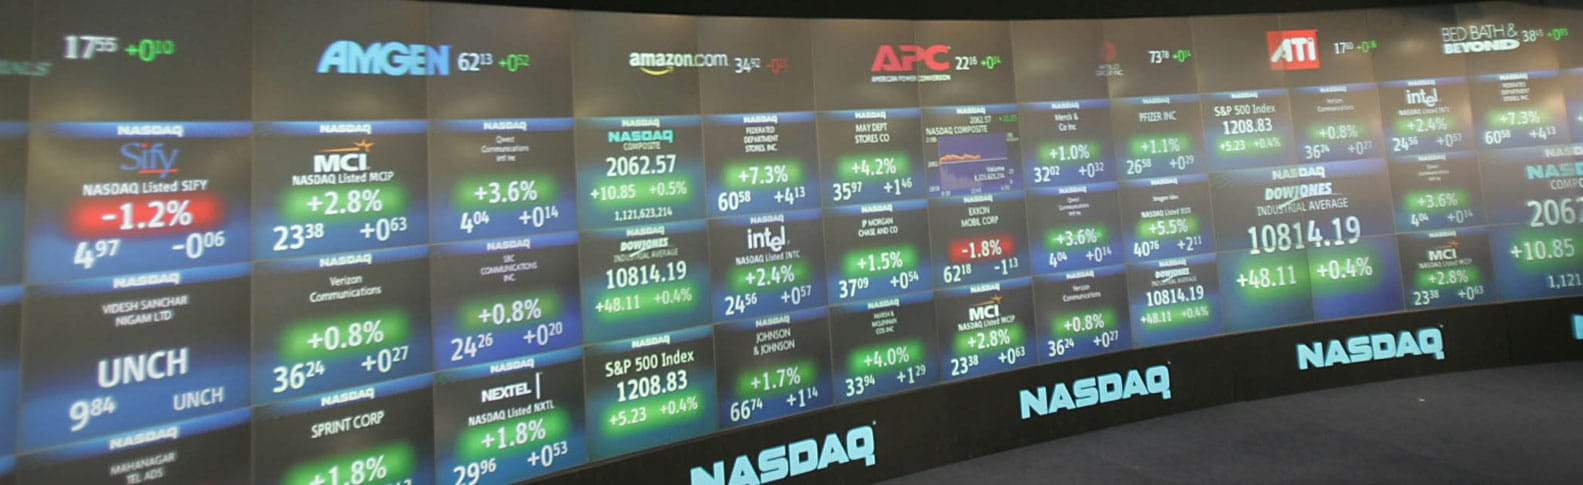 Stock Market Trading Team Building Activity